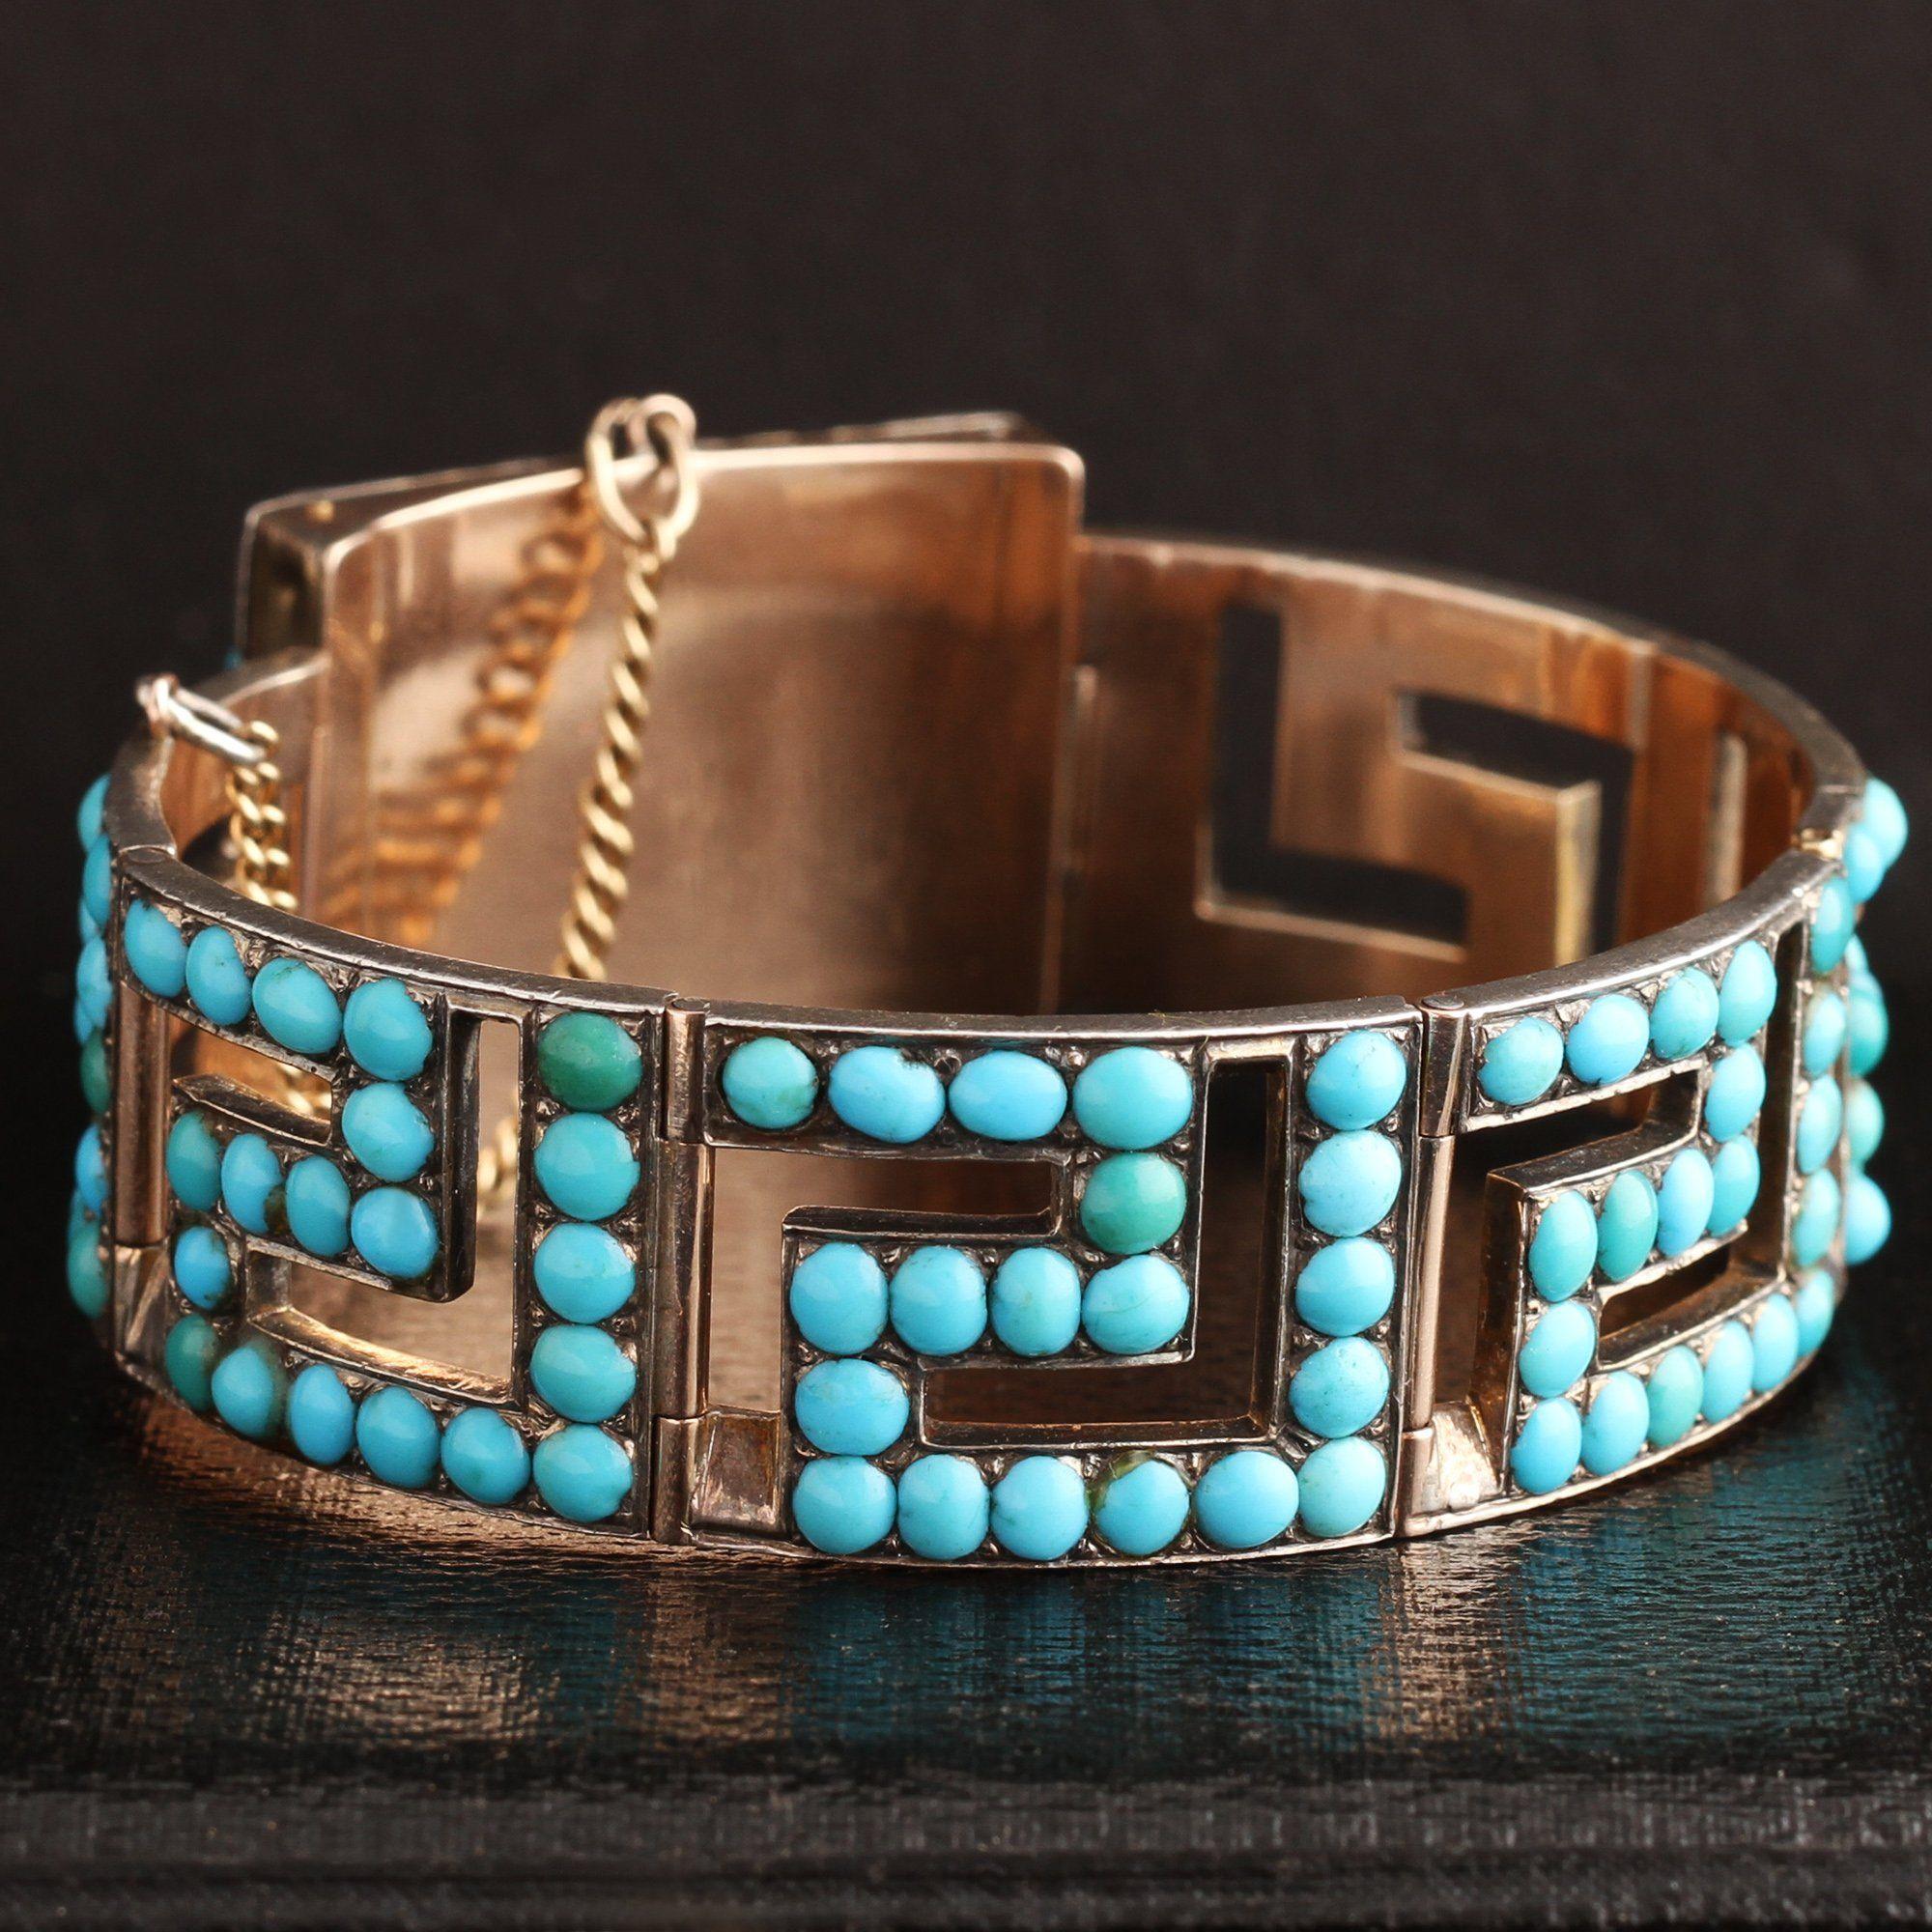 Victorian Rose Gold and Turquoise Greek Key Bracelet